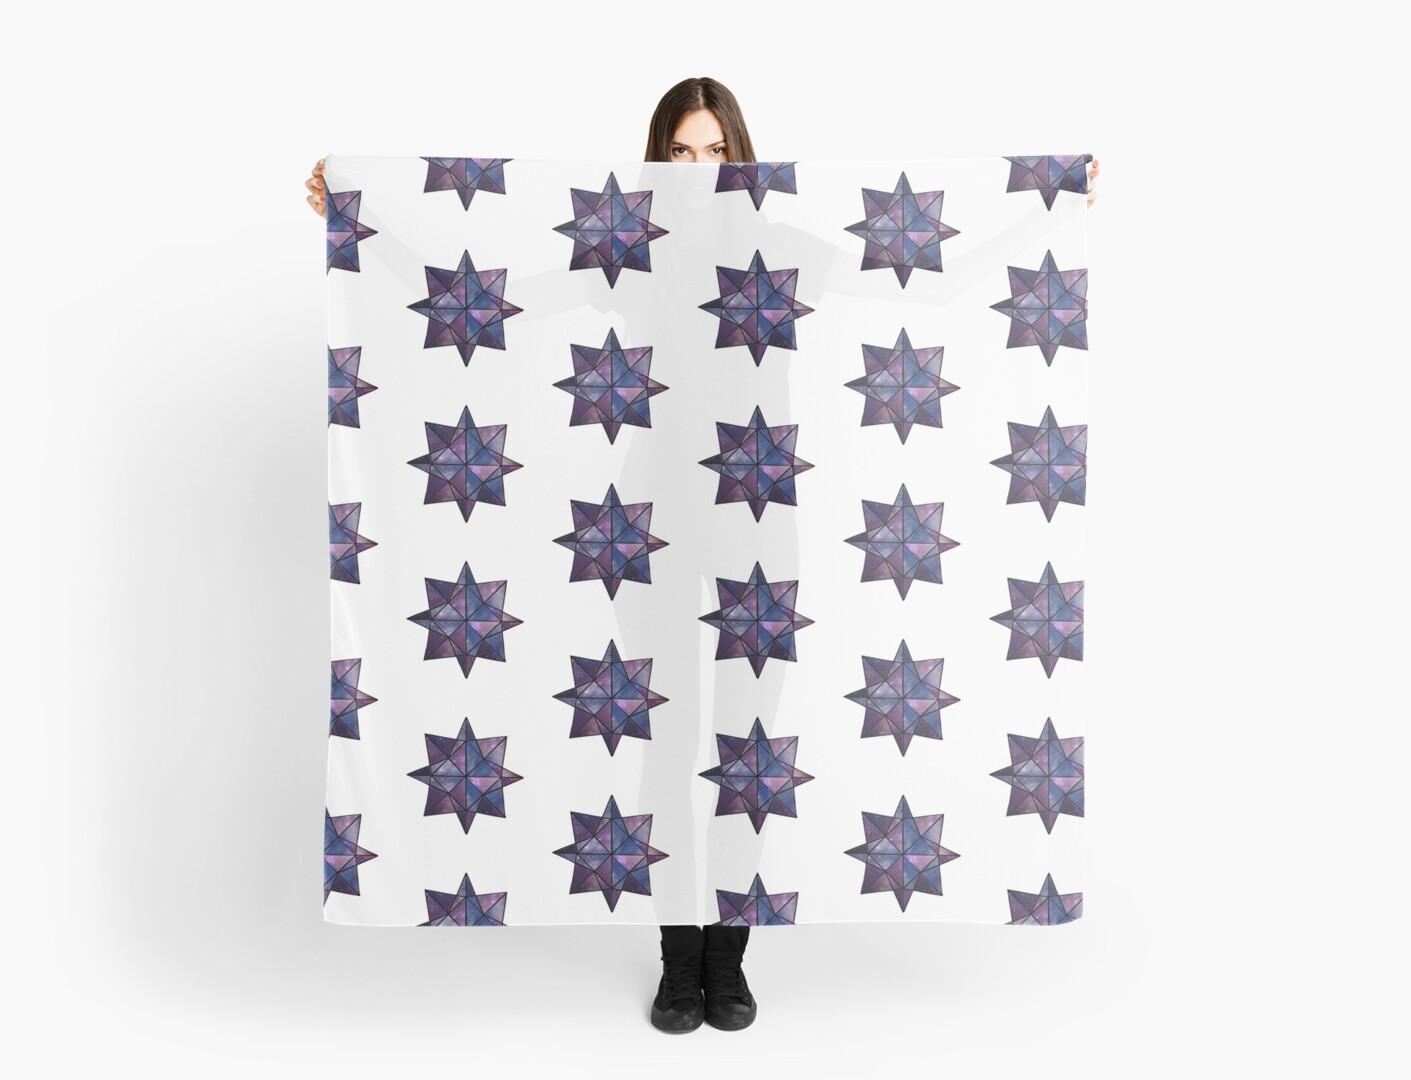 Star cosmos 1 by Jodie McCrystal